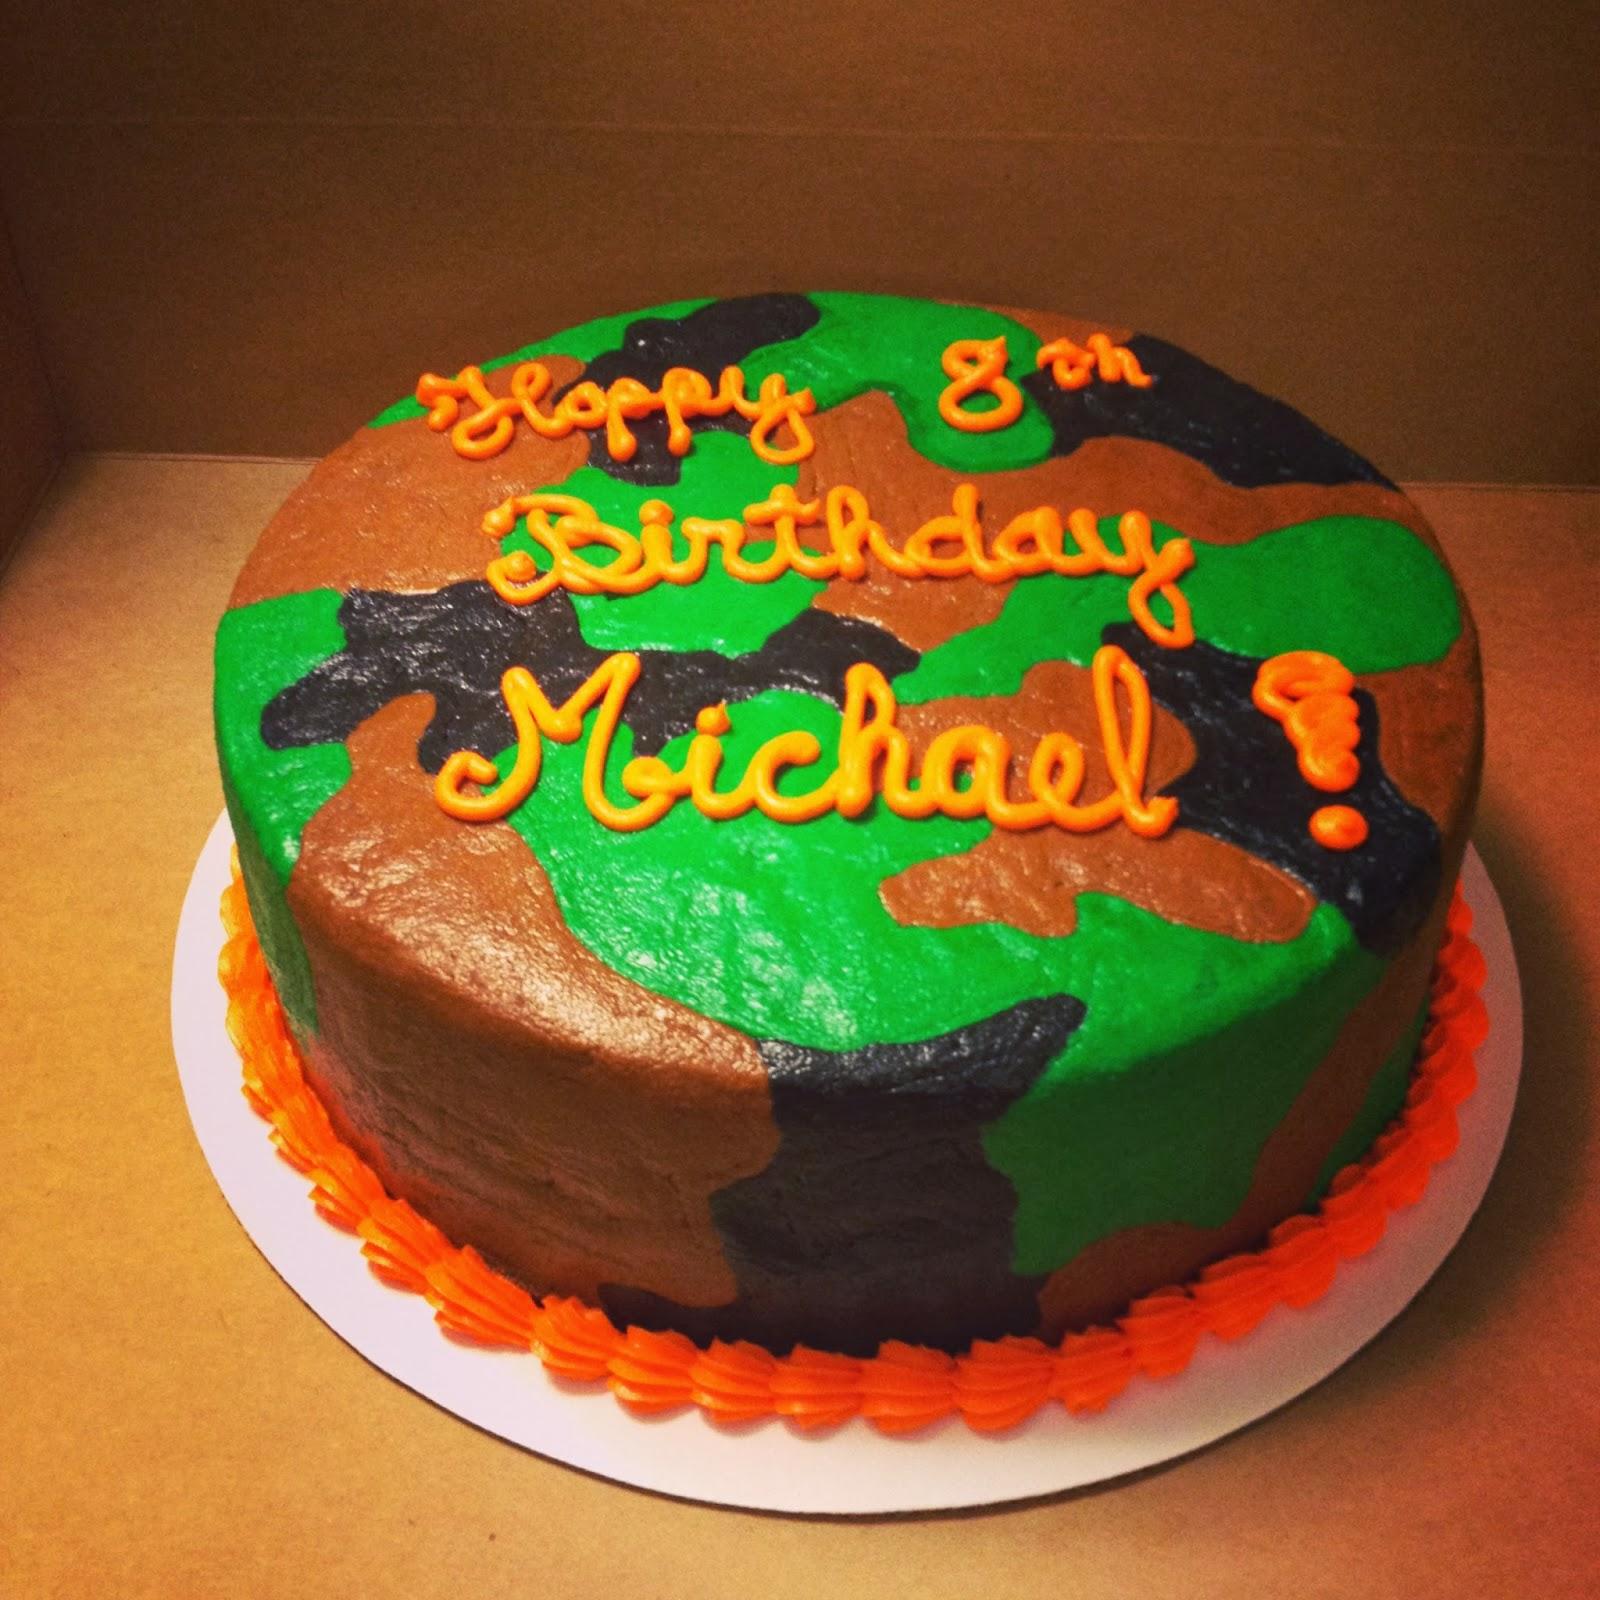 Blue Camo Birthday Cake Image Inspiration of Cake and Birthday